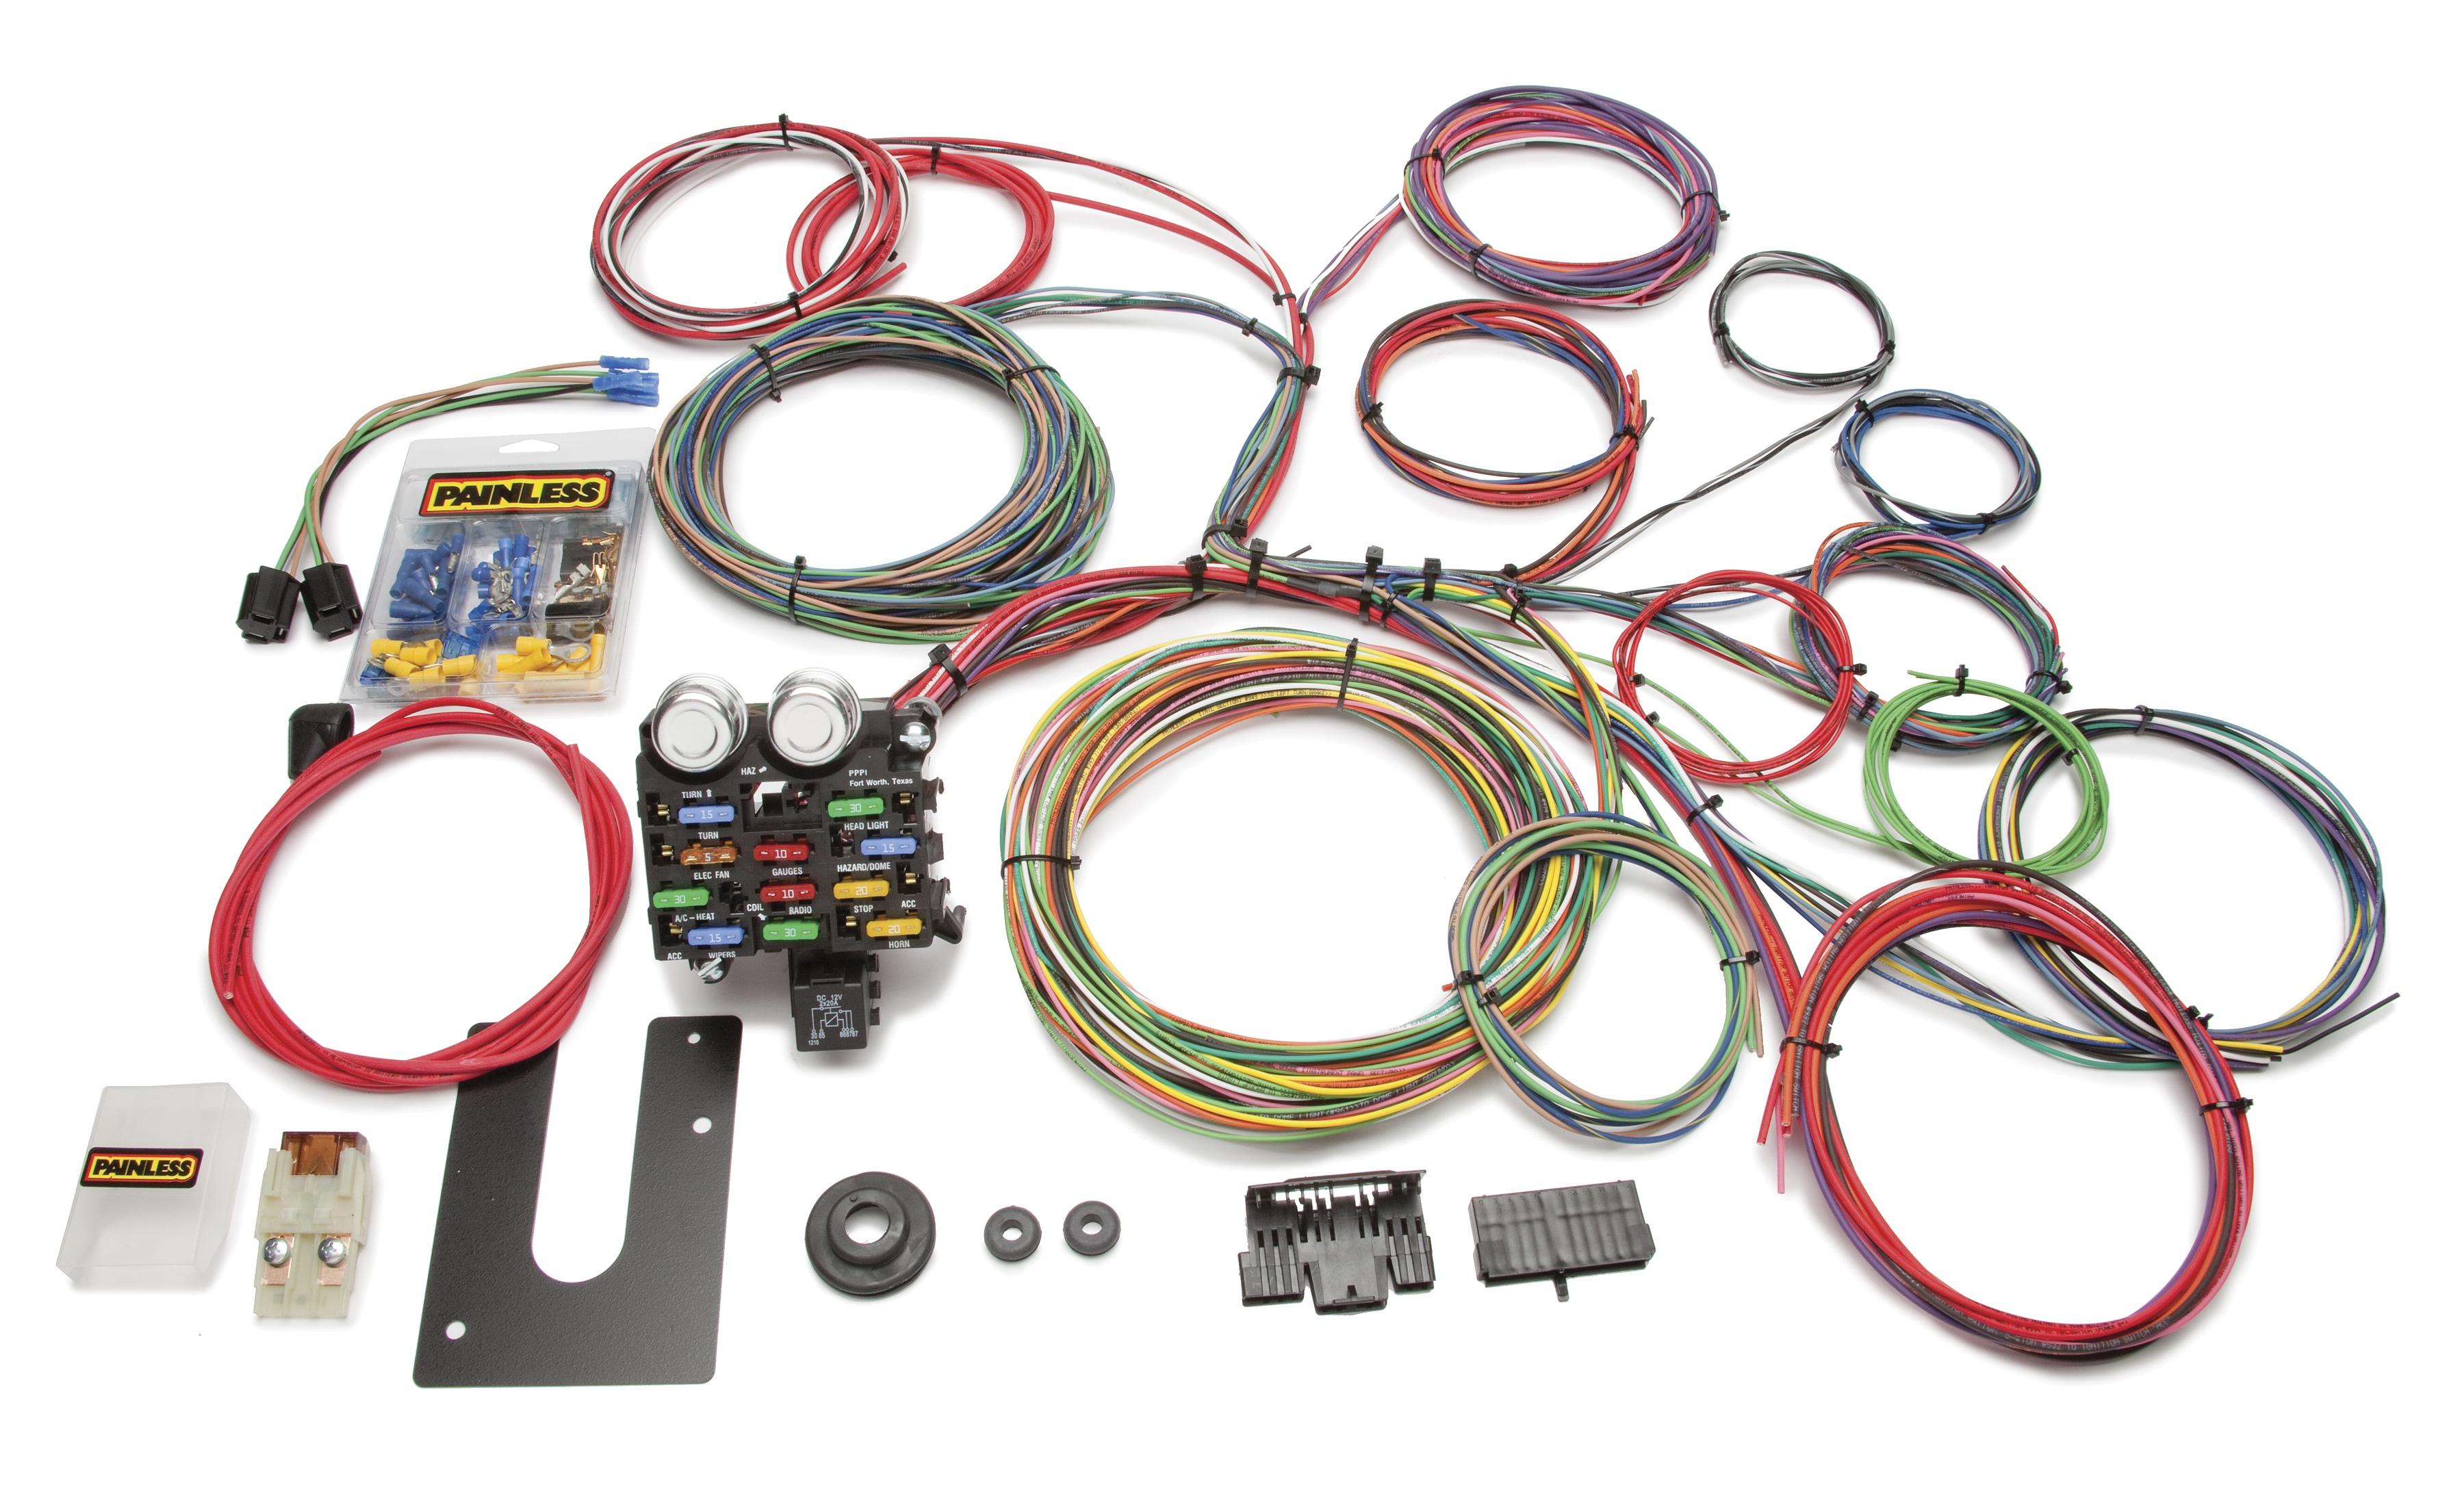 Centech Wiring Harness Early Bronco Instructions 48 Diagram Jeep Cj7 Cj To Prf 10102resize6652c401 Diagrams Cj8